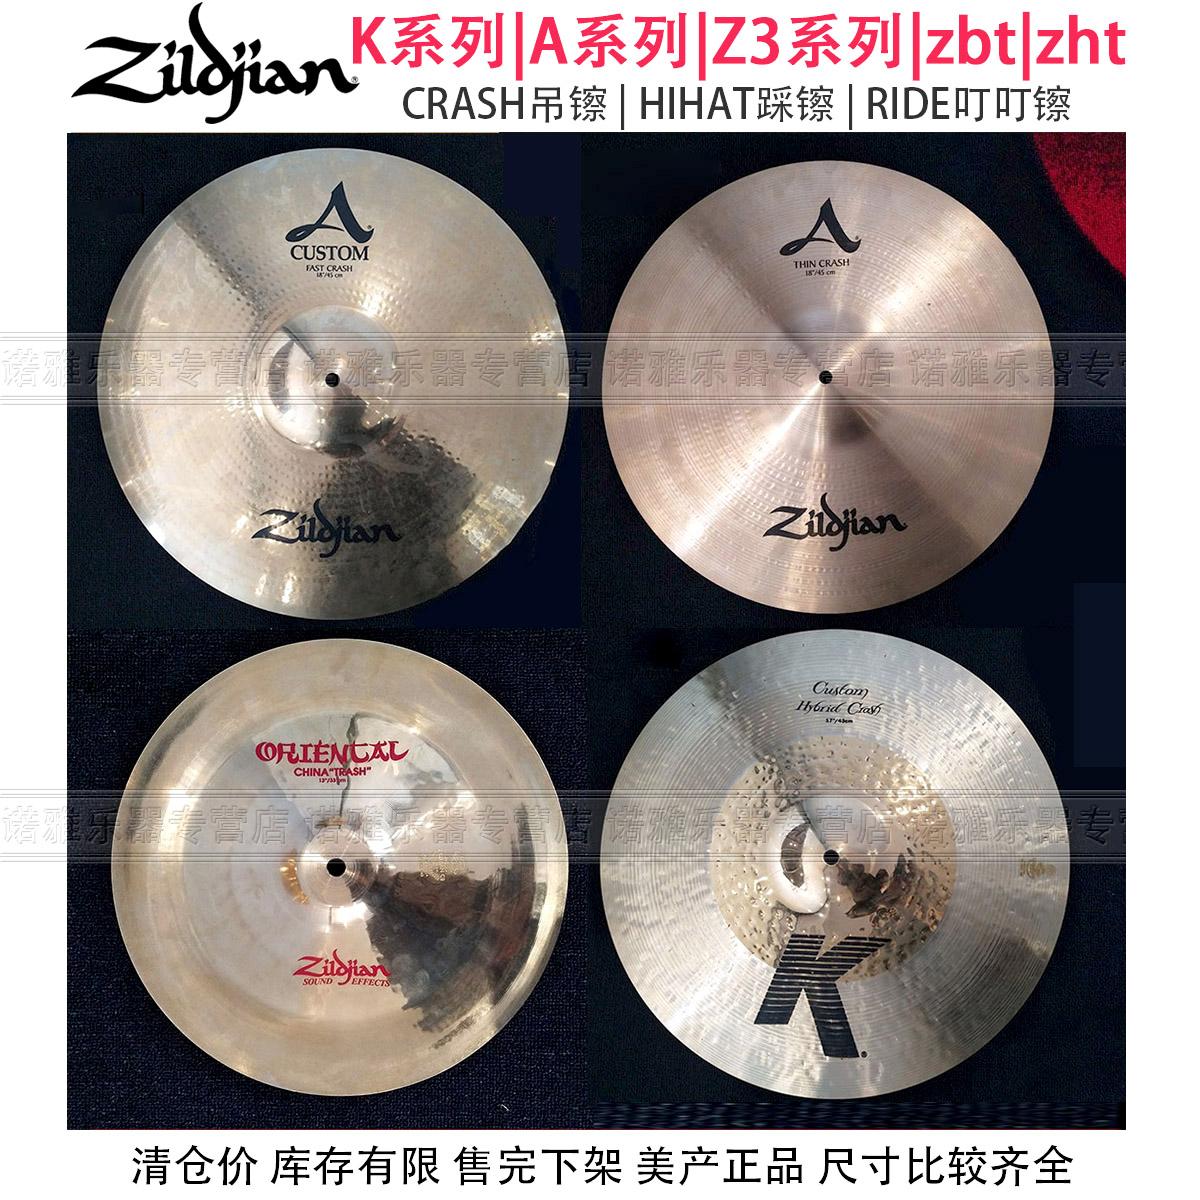 [Zildjian知音K系列A系列Z3系列zbtzht美产踩镲吊镲叮叮镲镲片]